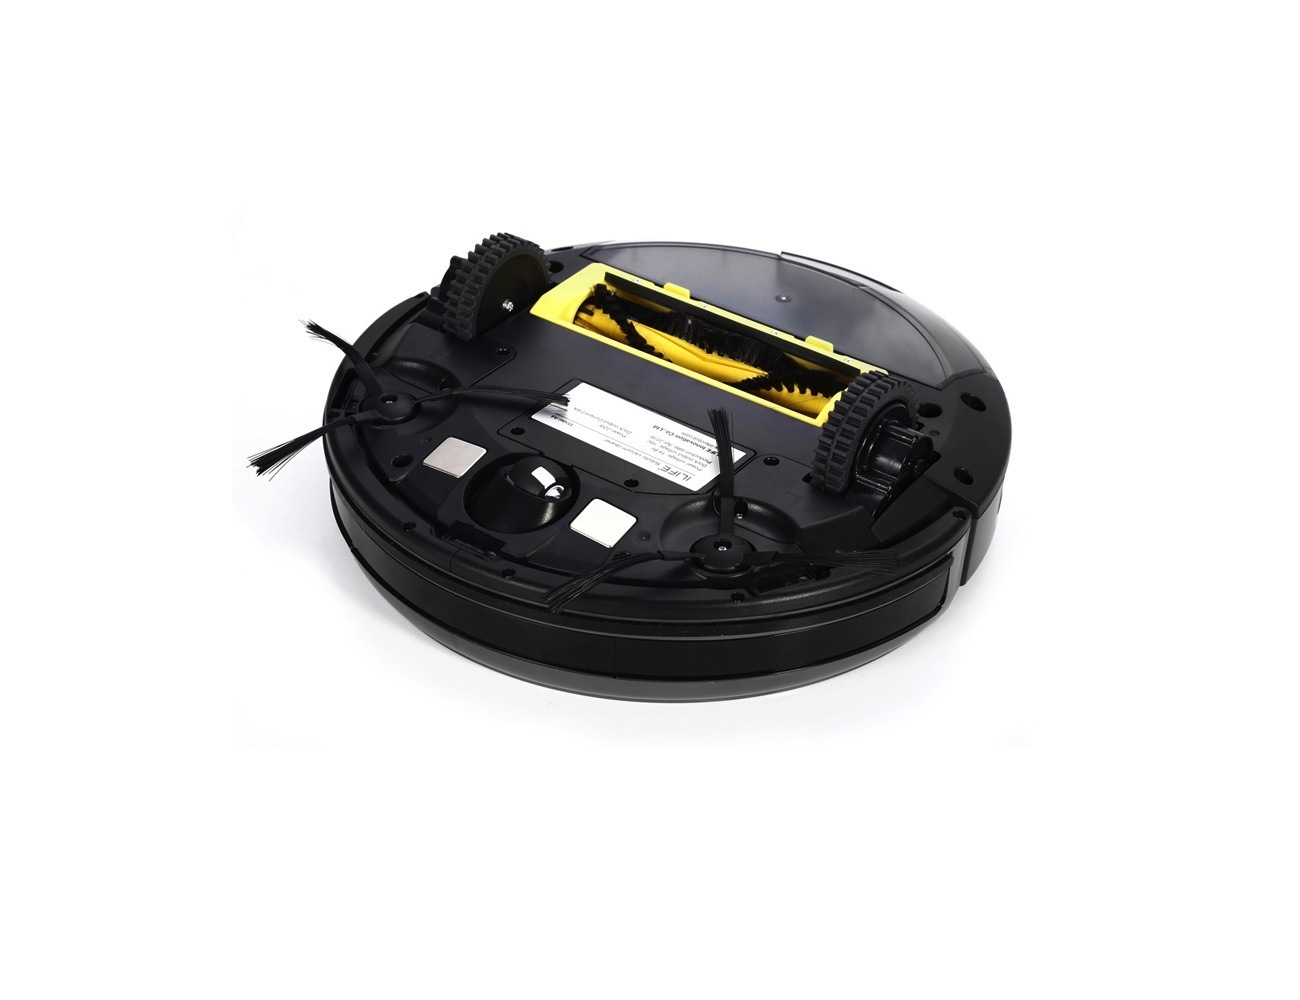 ILIFE A4 Smart Robotic Vacuum Cleaner